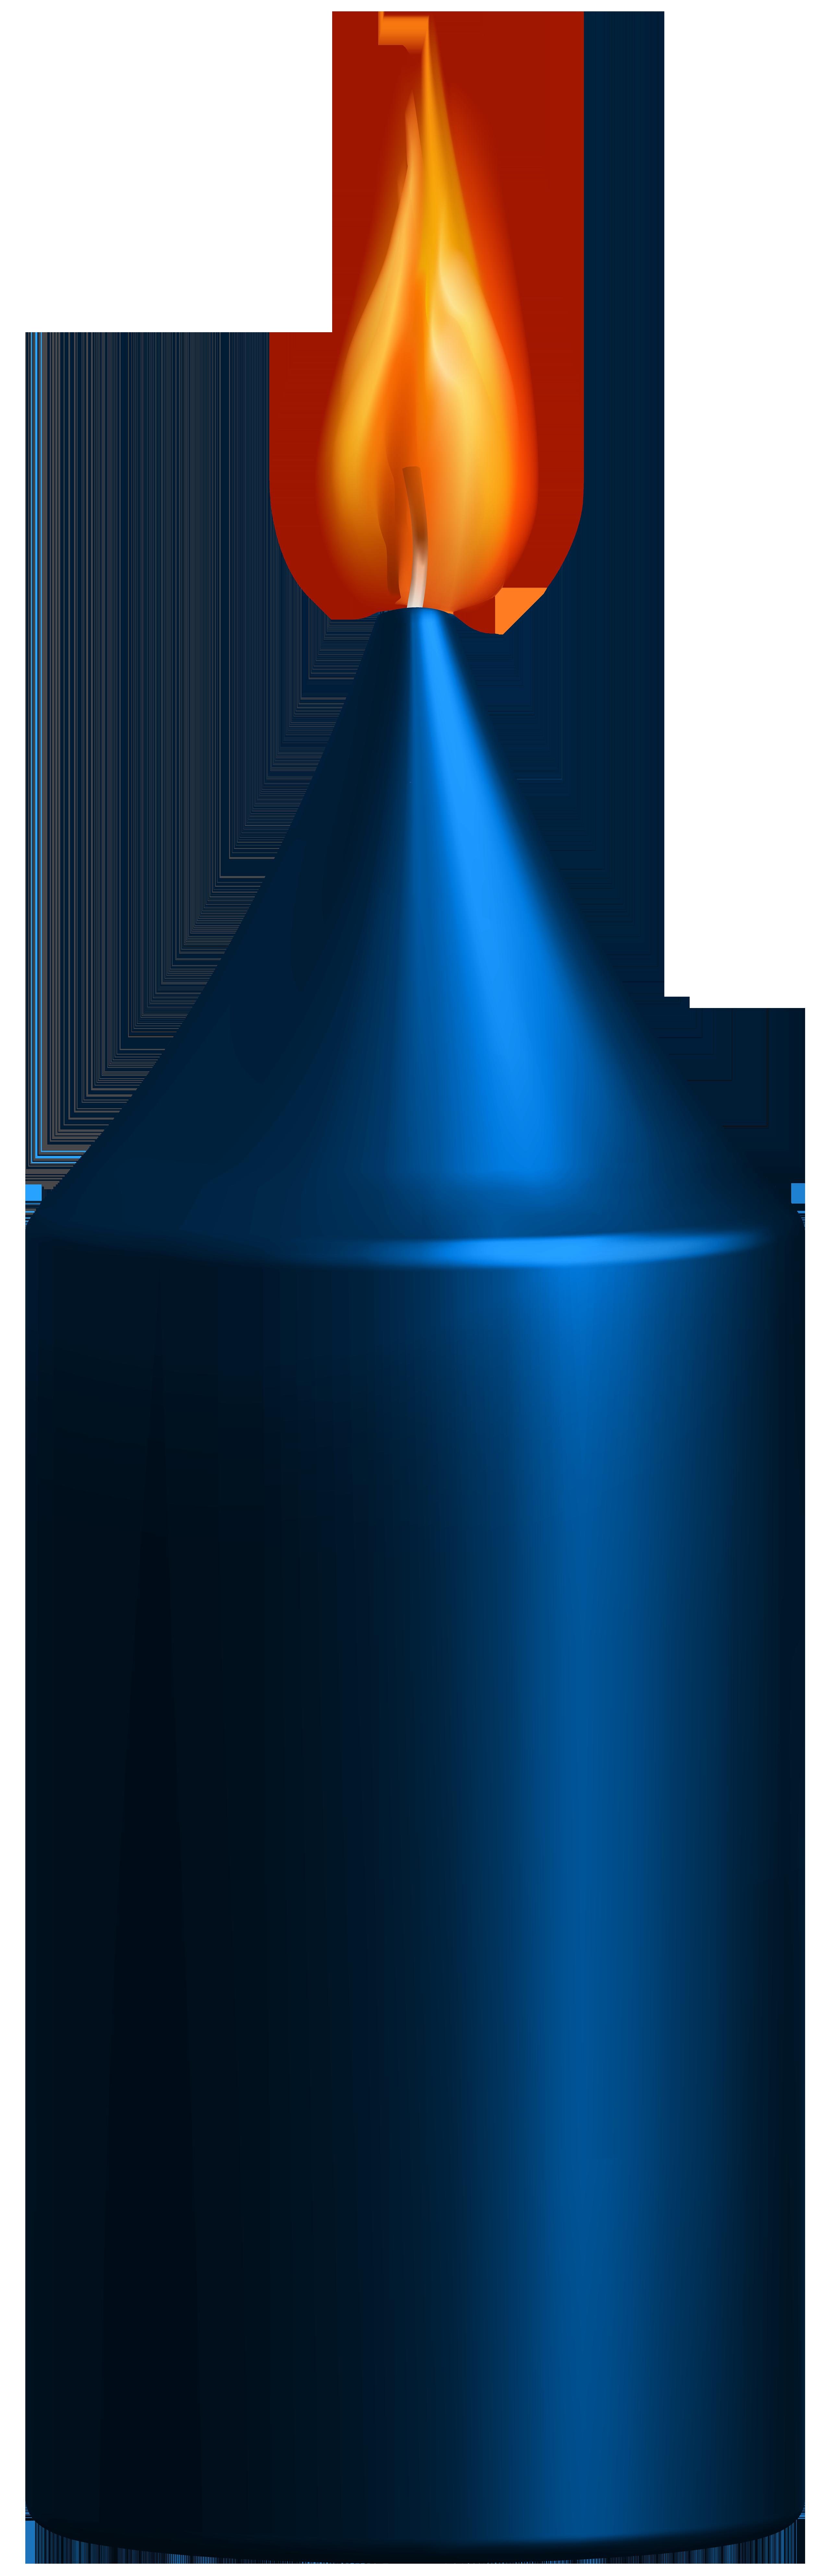 2568x7940 Blue Candle Png Clip Art